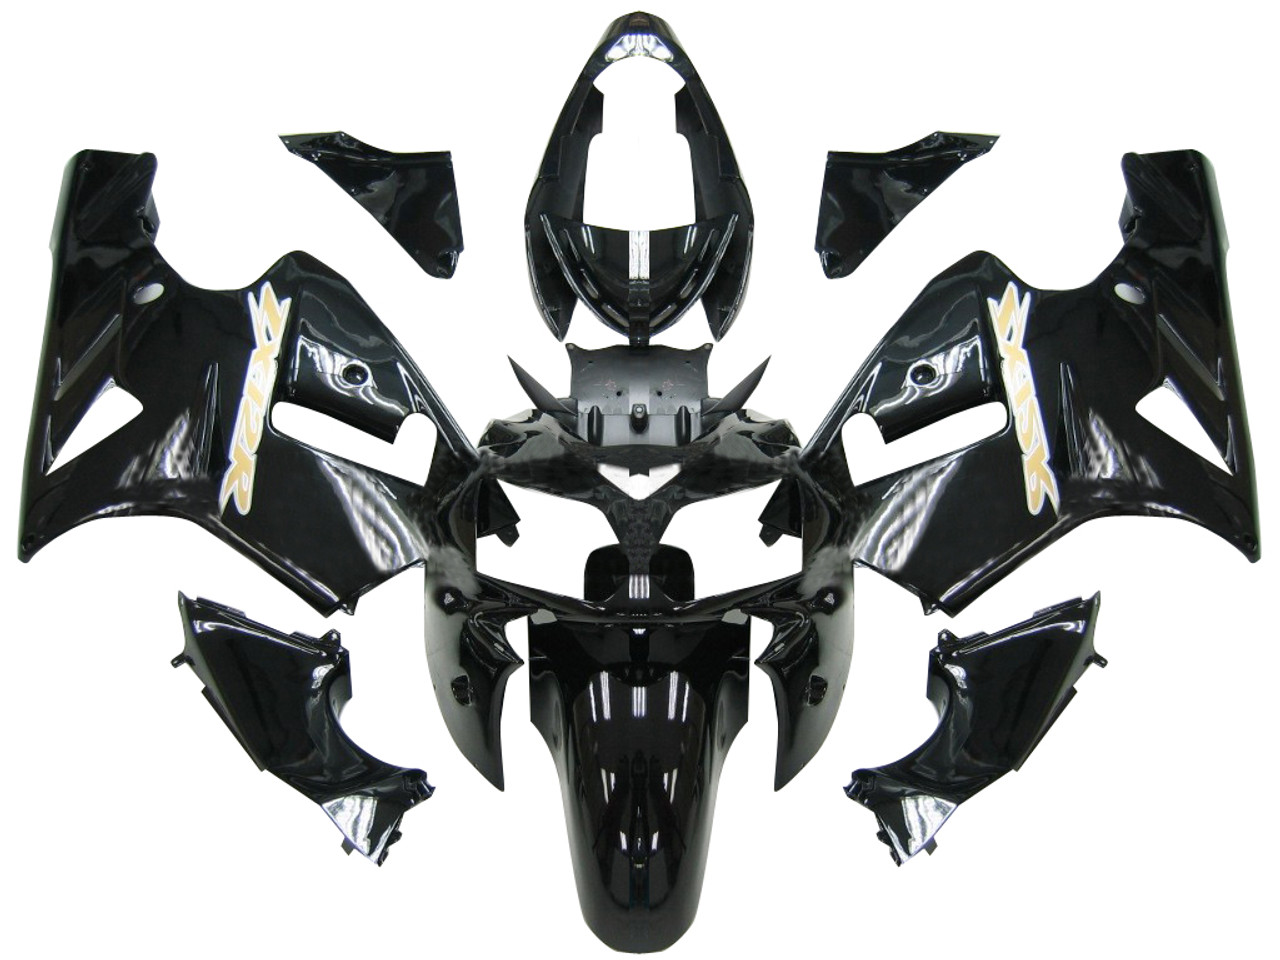 Fairings Kawasaki ZX12R Black ZX12R Racing (2002-2004)